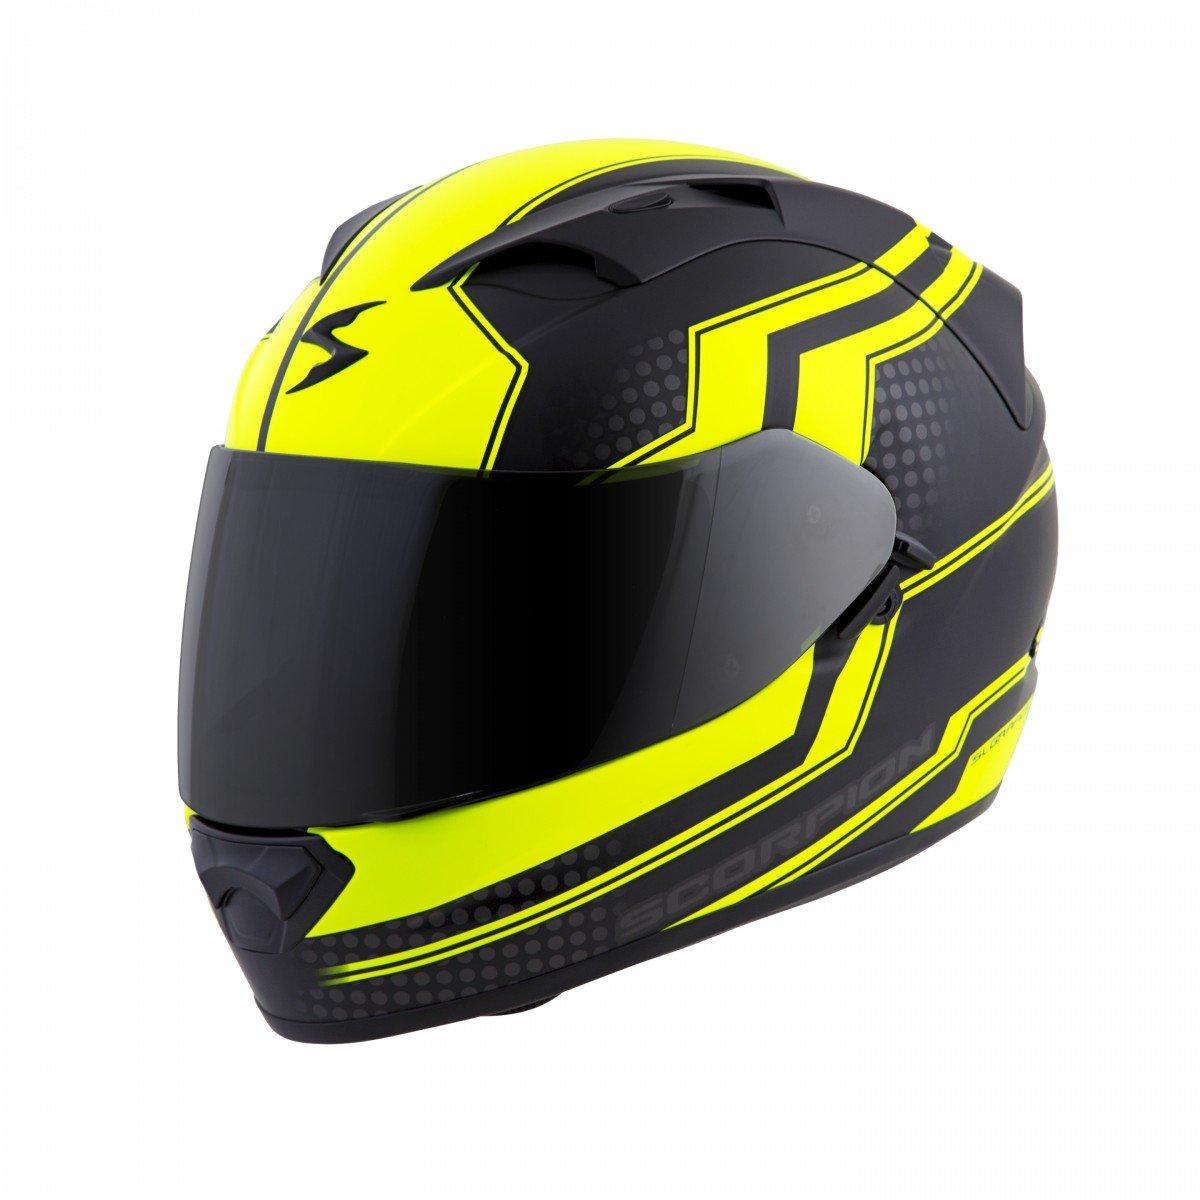 Scorpion EXO 1200 Air Stream Tour Fluo Yellow Black Full Face Motorcycle Helmet